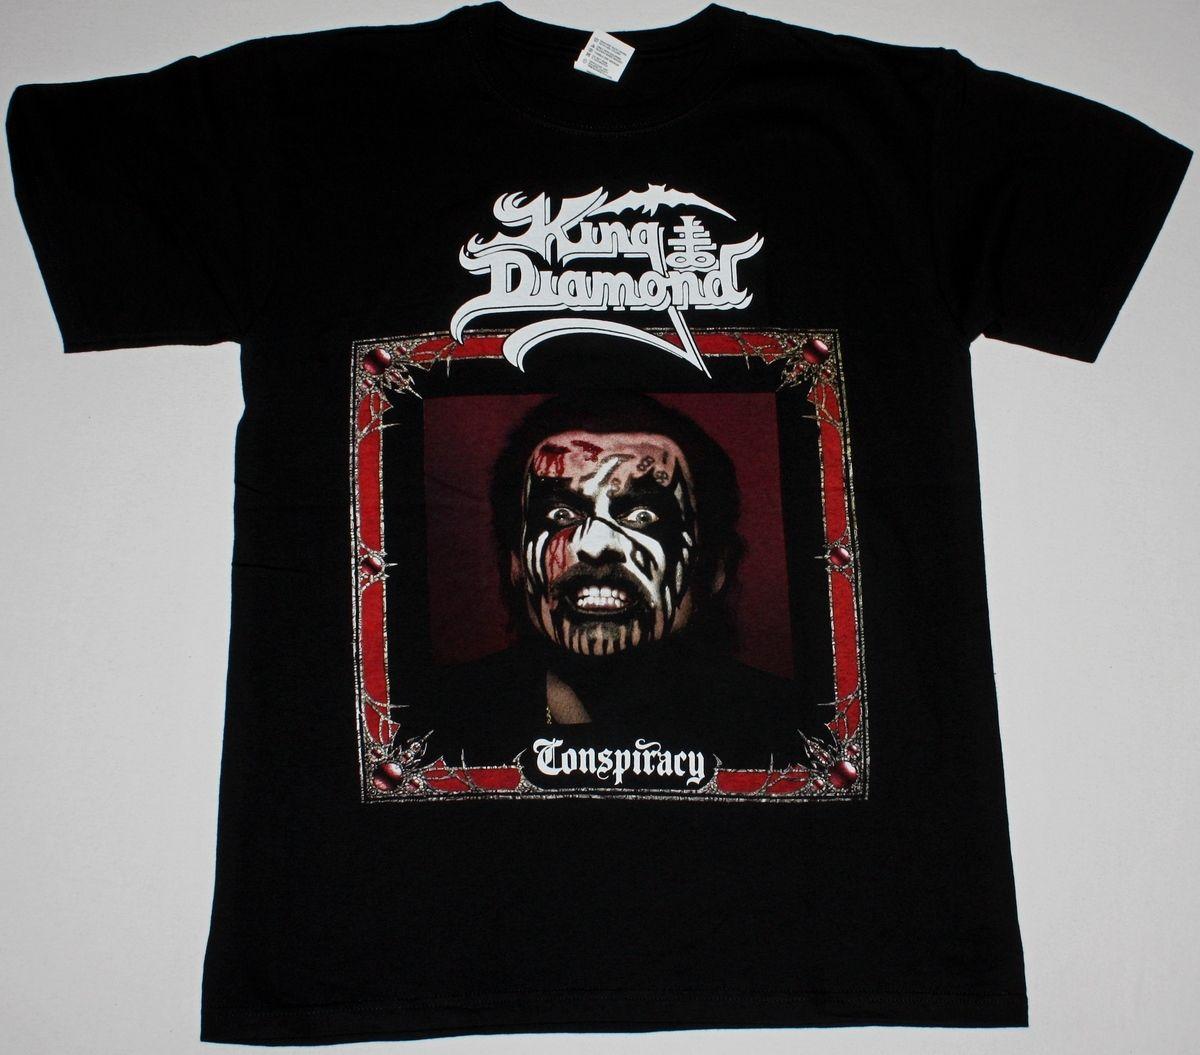 KING DIAMOND CONSPIRACY BLACK T SHIRT MERCYFUL FATE PORTRAIT HEAVY METAL Gift Print T-shirt,Hip Hop Tee Shirt,NEW ARRIVAL tees